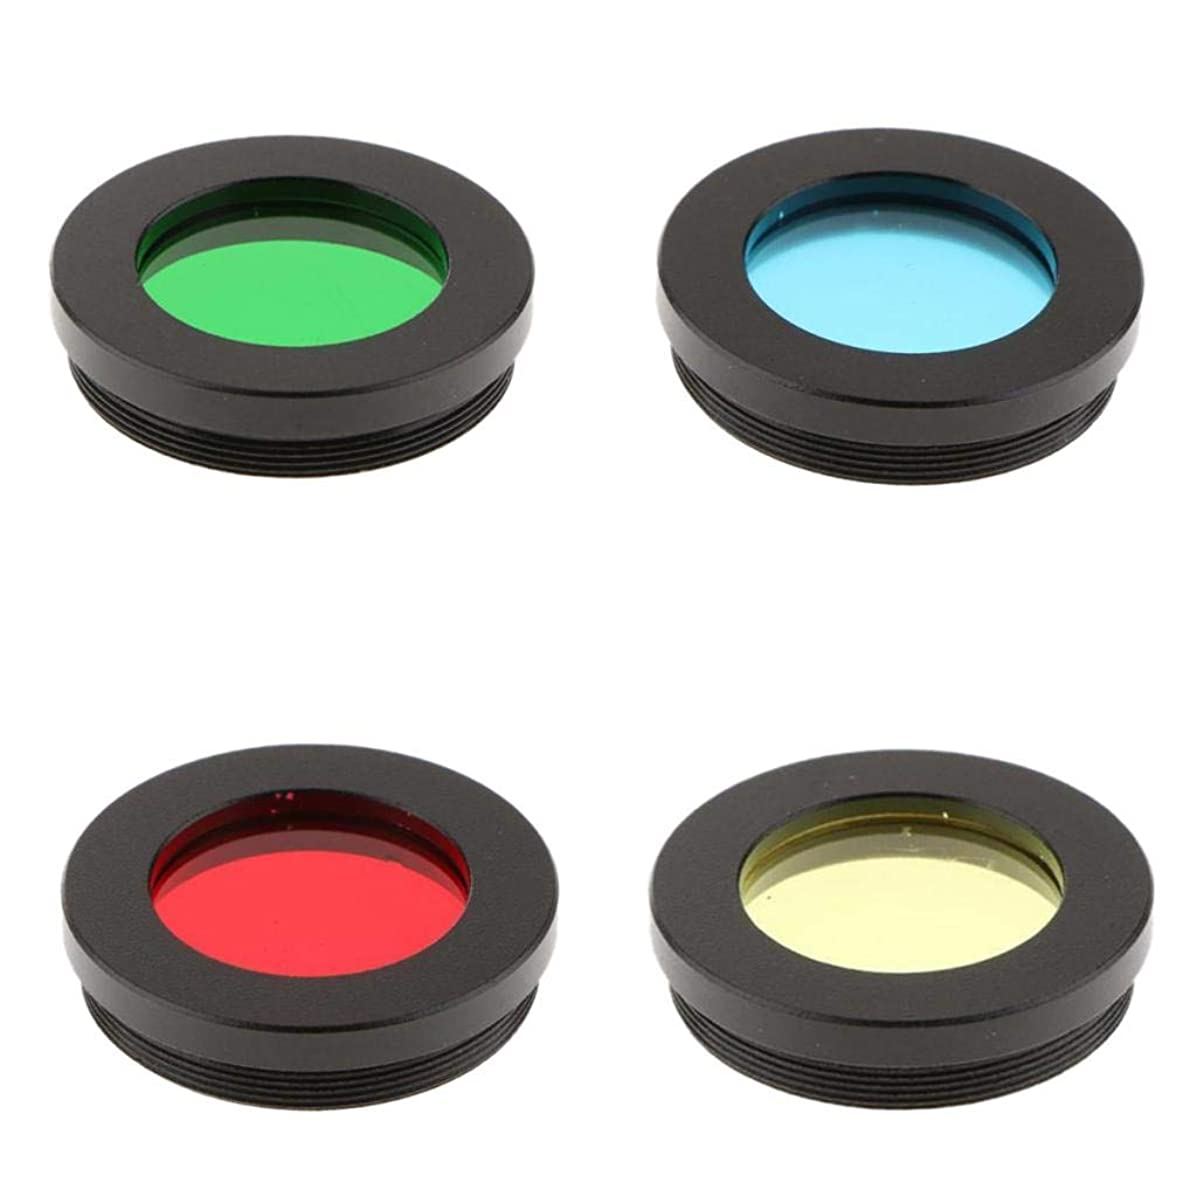 Baoblaze 4x Telescope Eyepiece Lens Color Filter Set 1.25'' Planet Jupiter, Mars, Saturn, Moon More Surface Detail